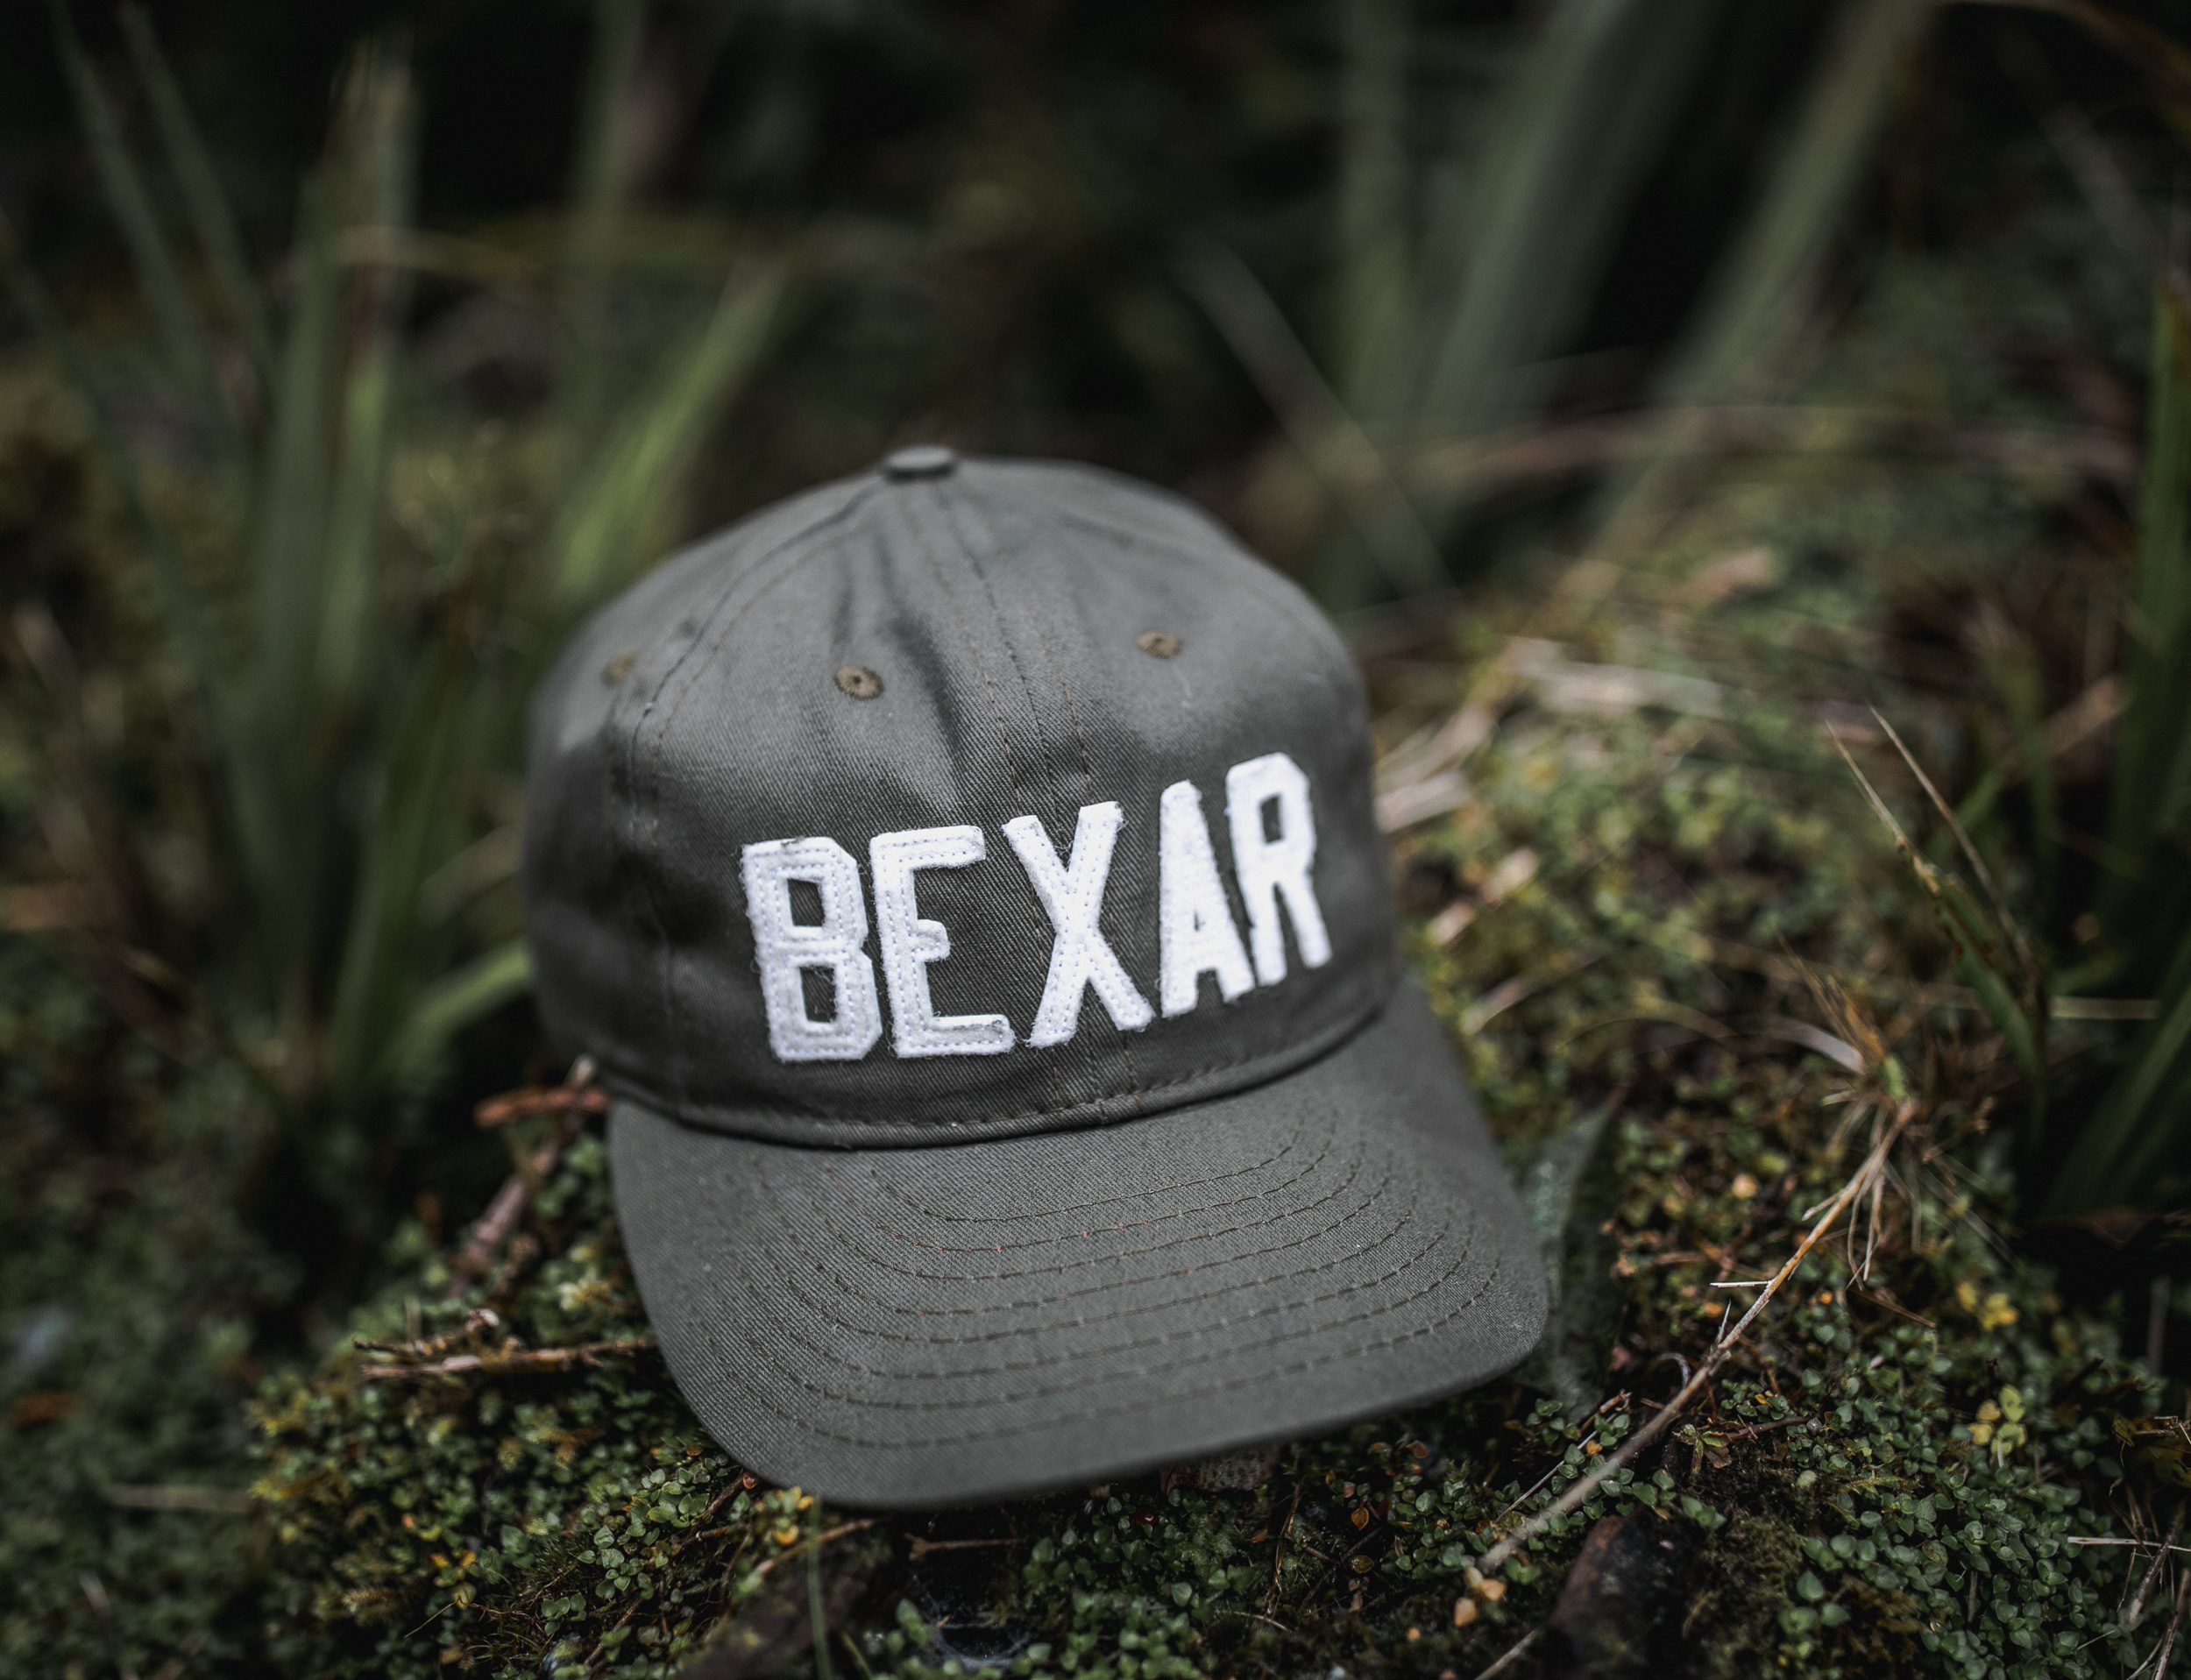 Bexar_1J3A8316.jpg